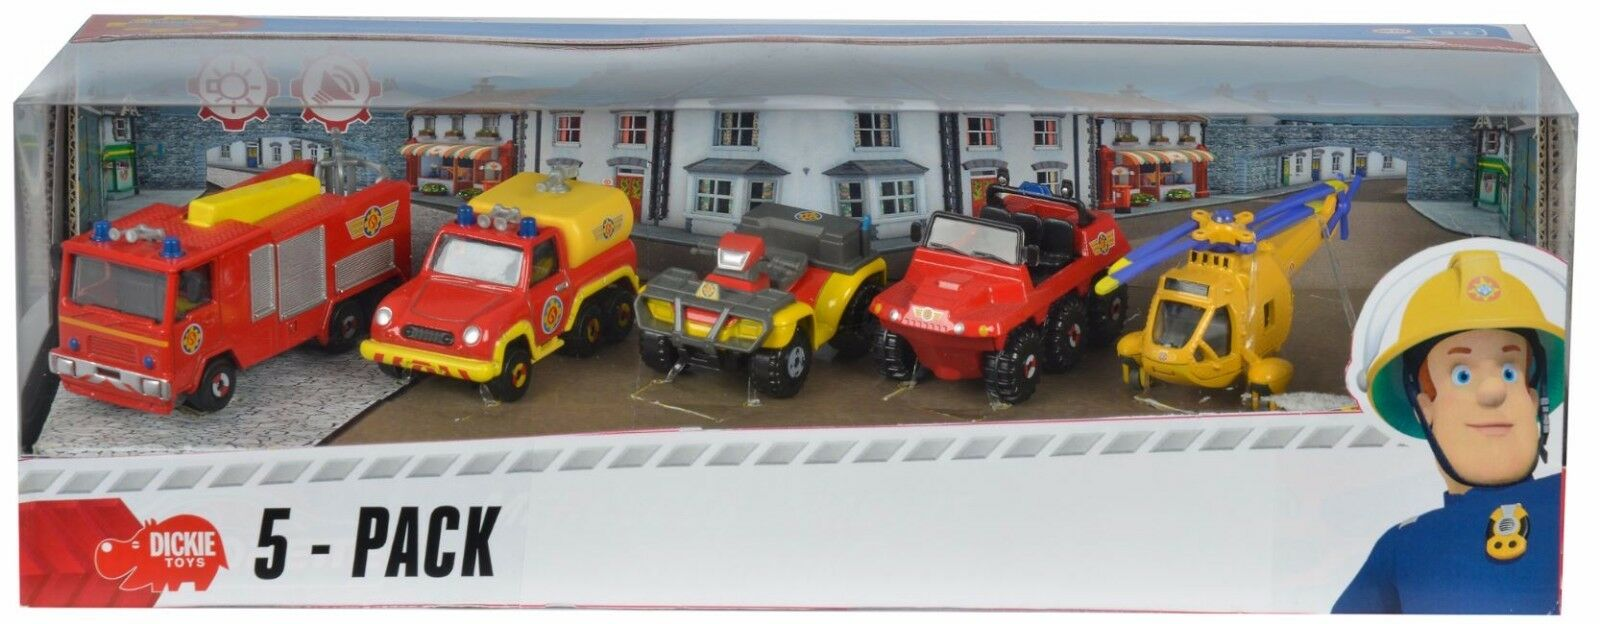 Modelo de coche vehículo vehículo vehículo de bomberos Fireman Sam Paquete de 5 Conjunto de Regalo 1 64. 3.14 pulgadas Caja de Metal 4abe4c